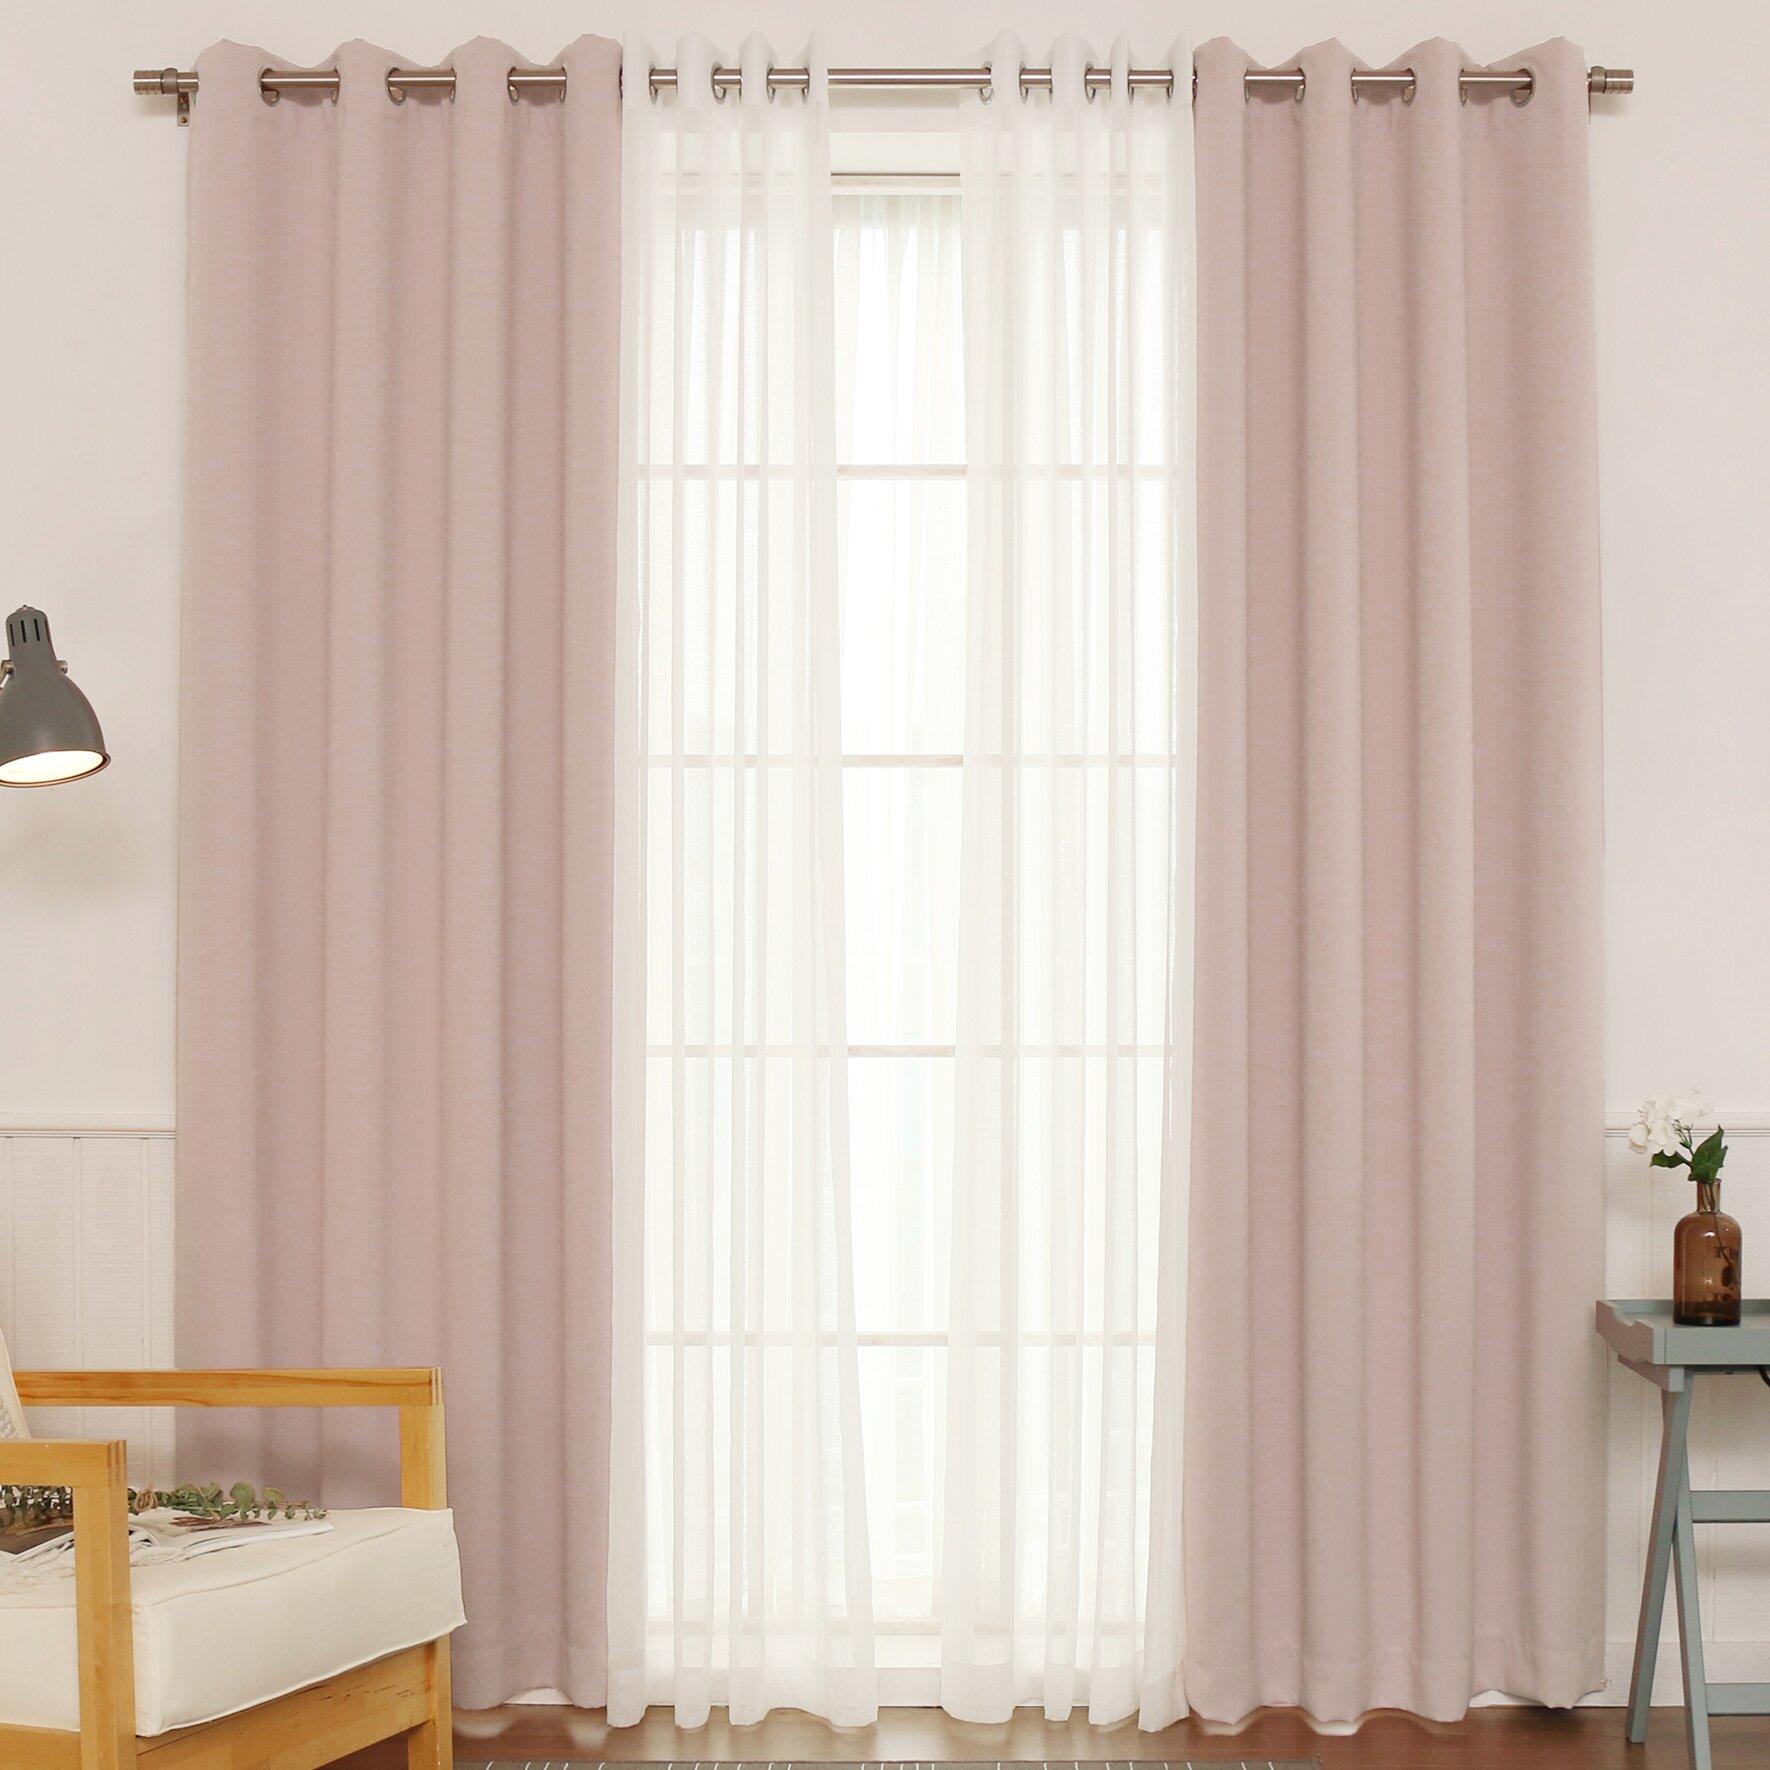 Curtains Home Decor Inc Fall River Ma Curtain